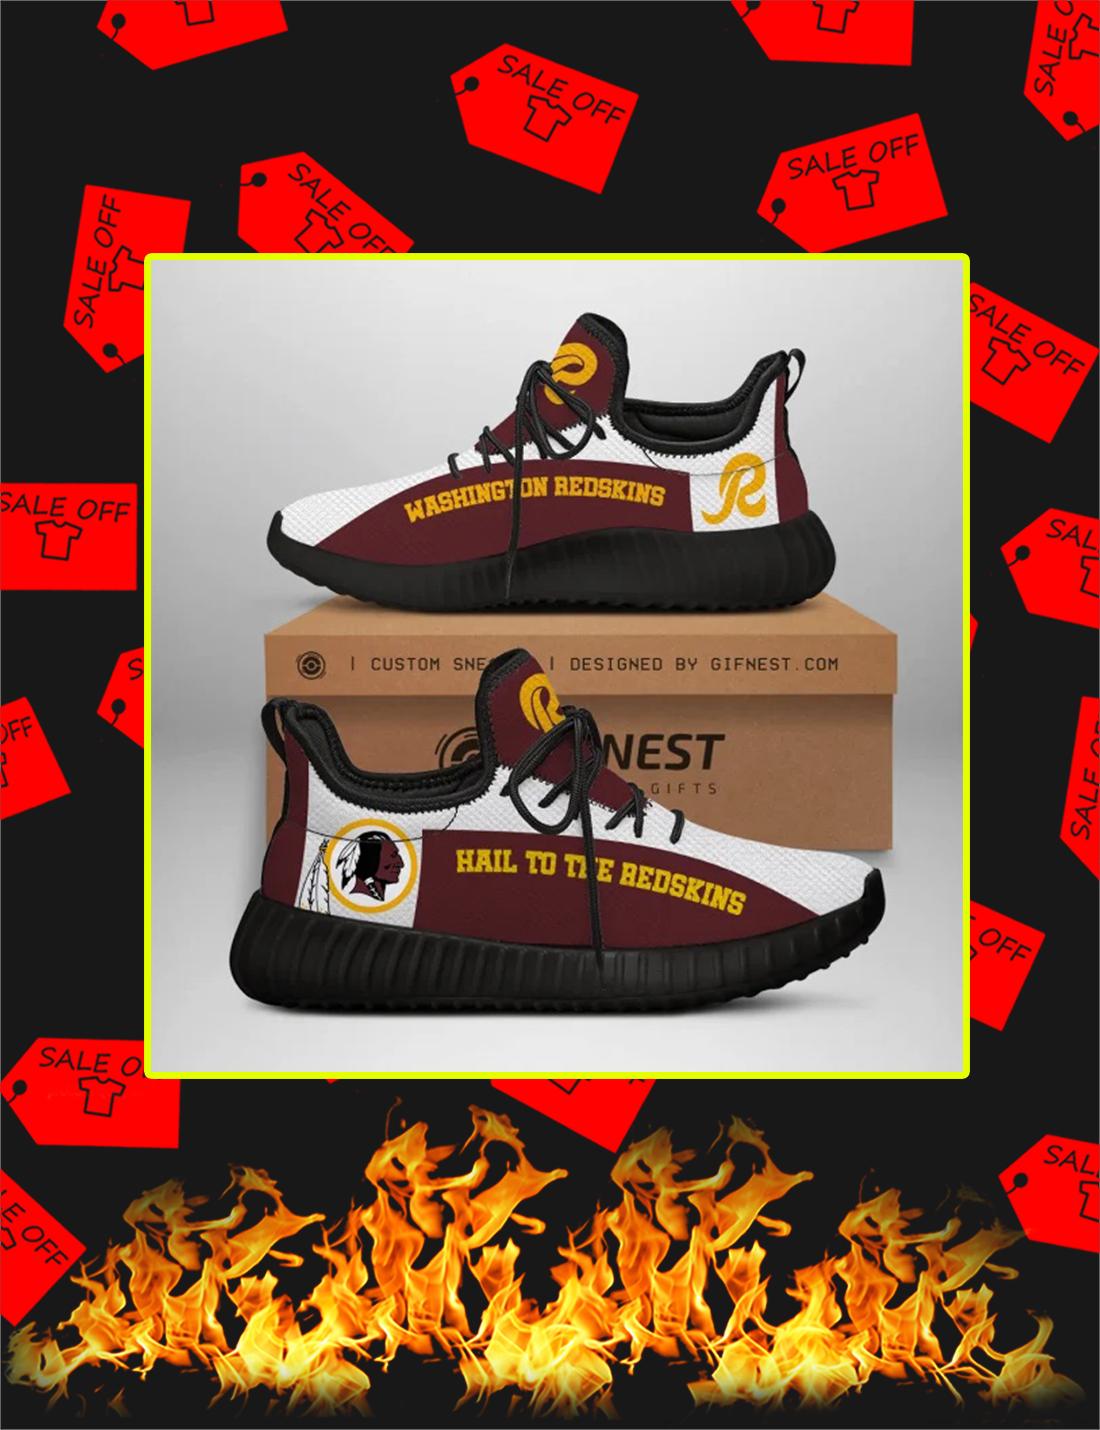 Washington Redskins NFL Yeezy Sneaker - Picture 2